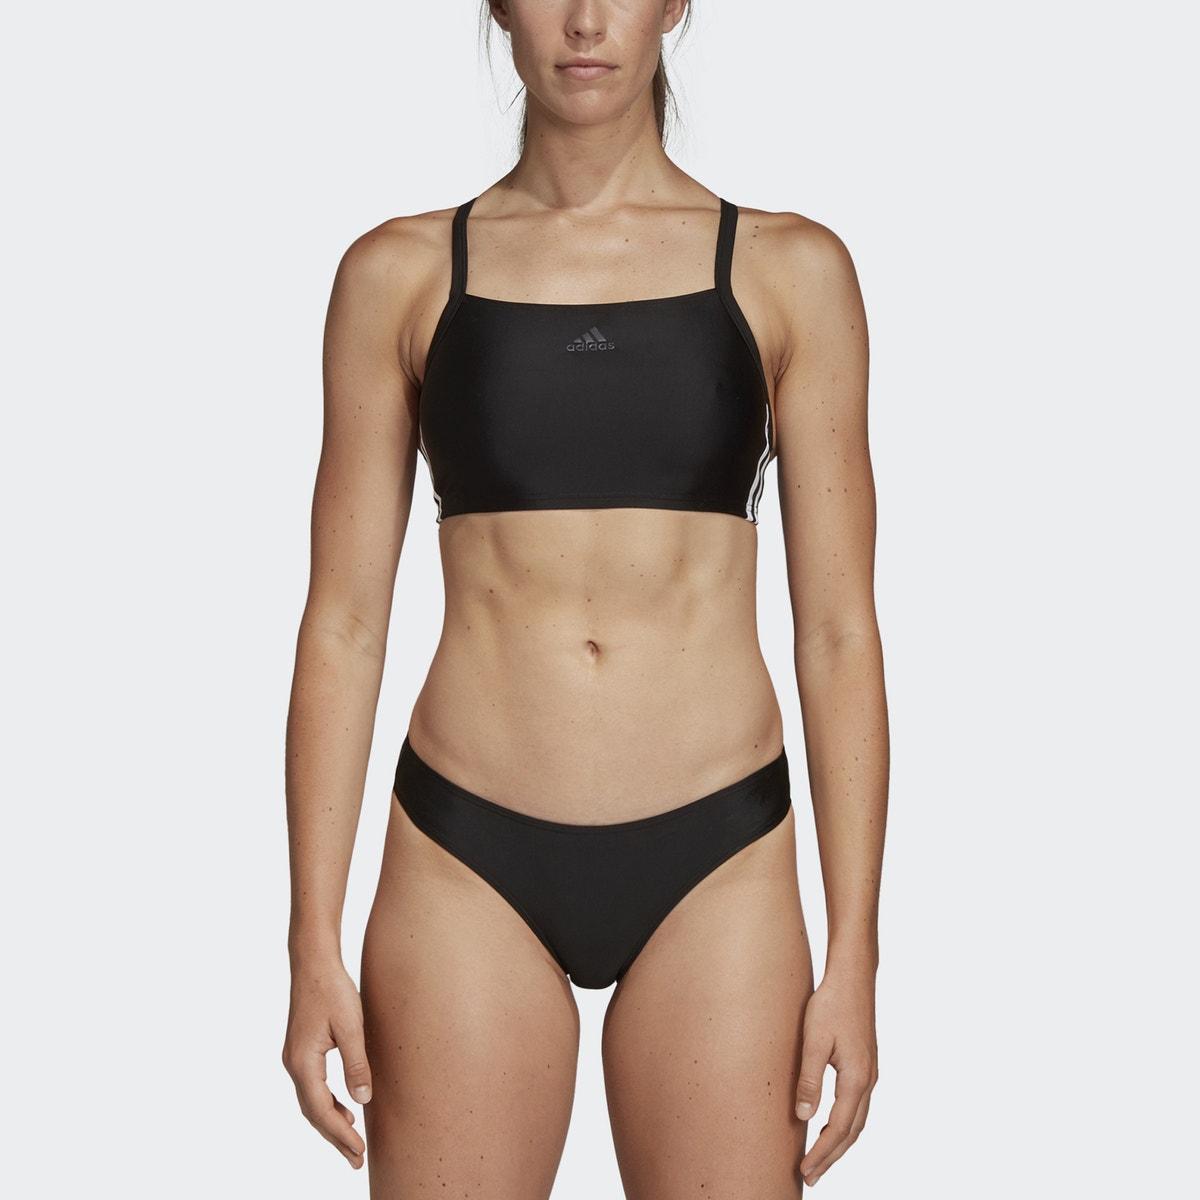 adidas Performance - Adidas Performance Μπικίνι κολύμβησης 350150567 - 6527